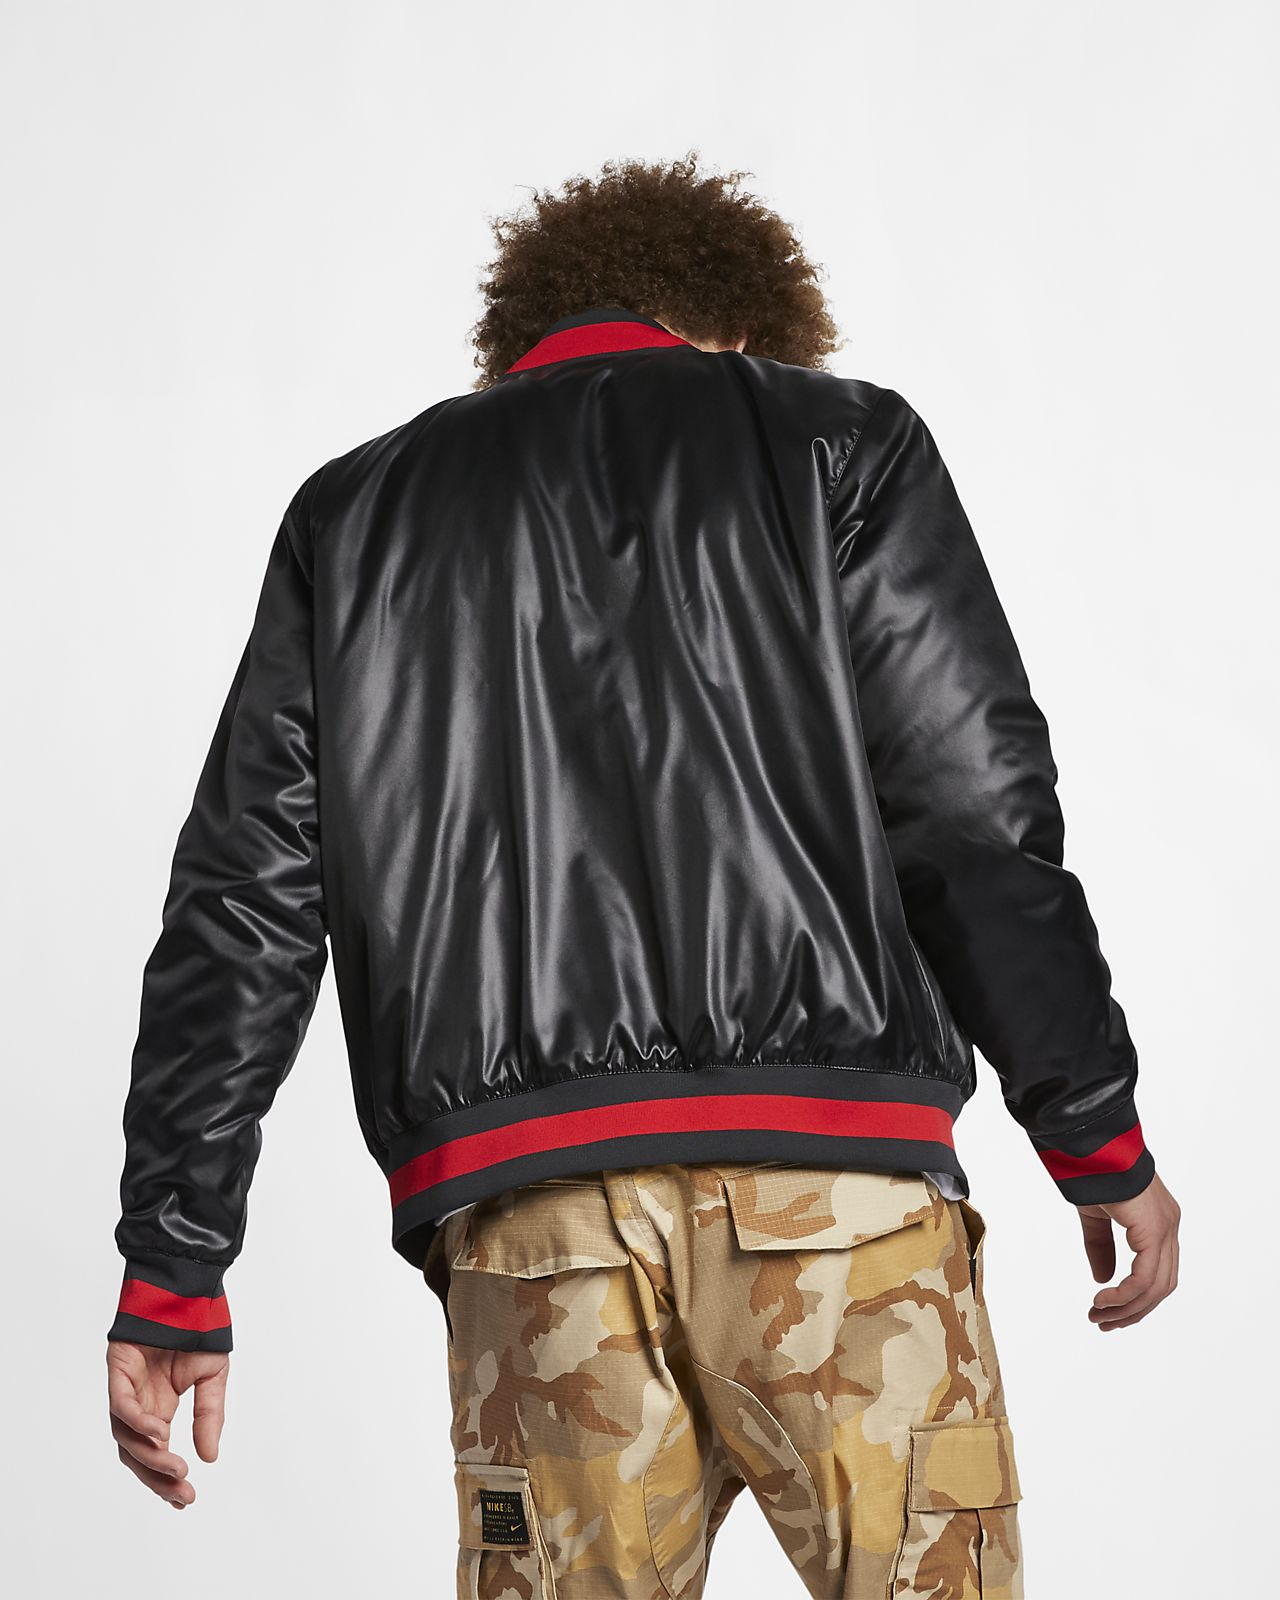 innovative design d266c abf66 ... Nike SB x NBA Men s Bomber Jacket